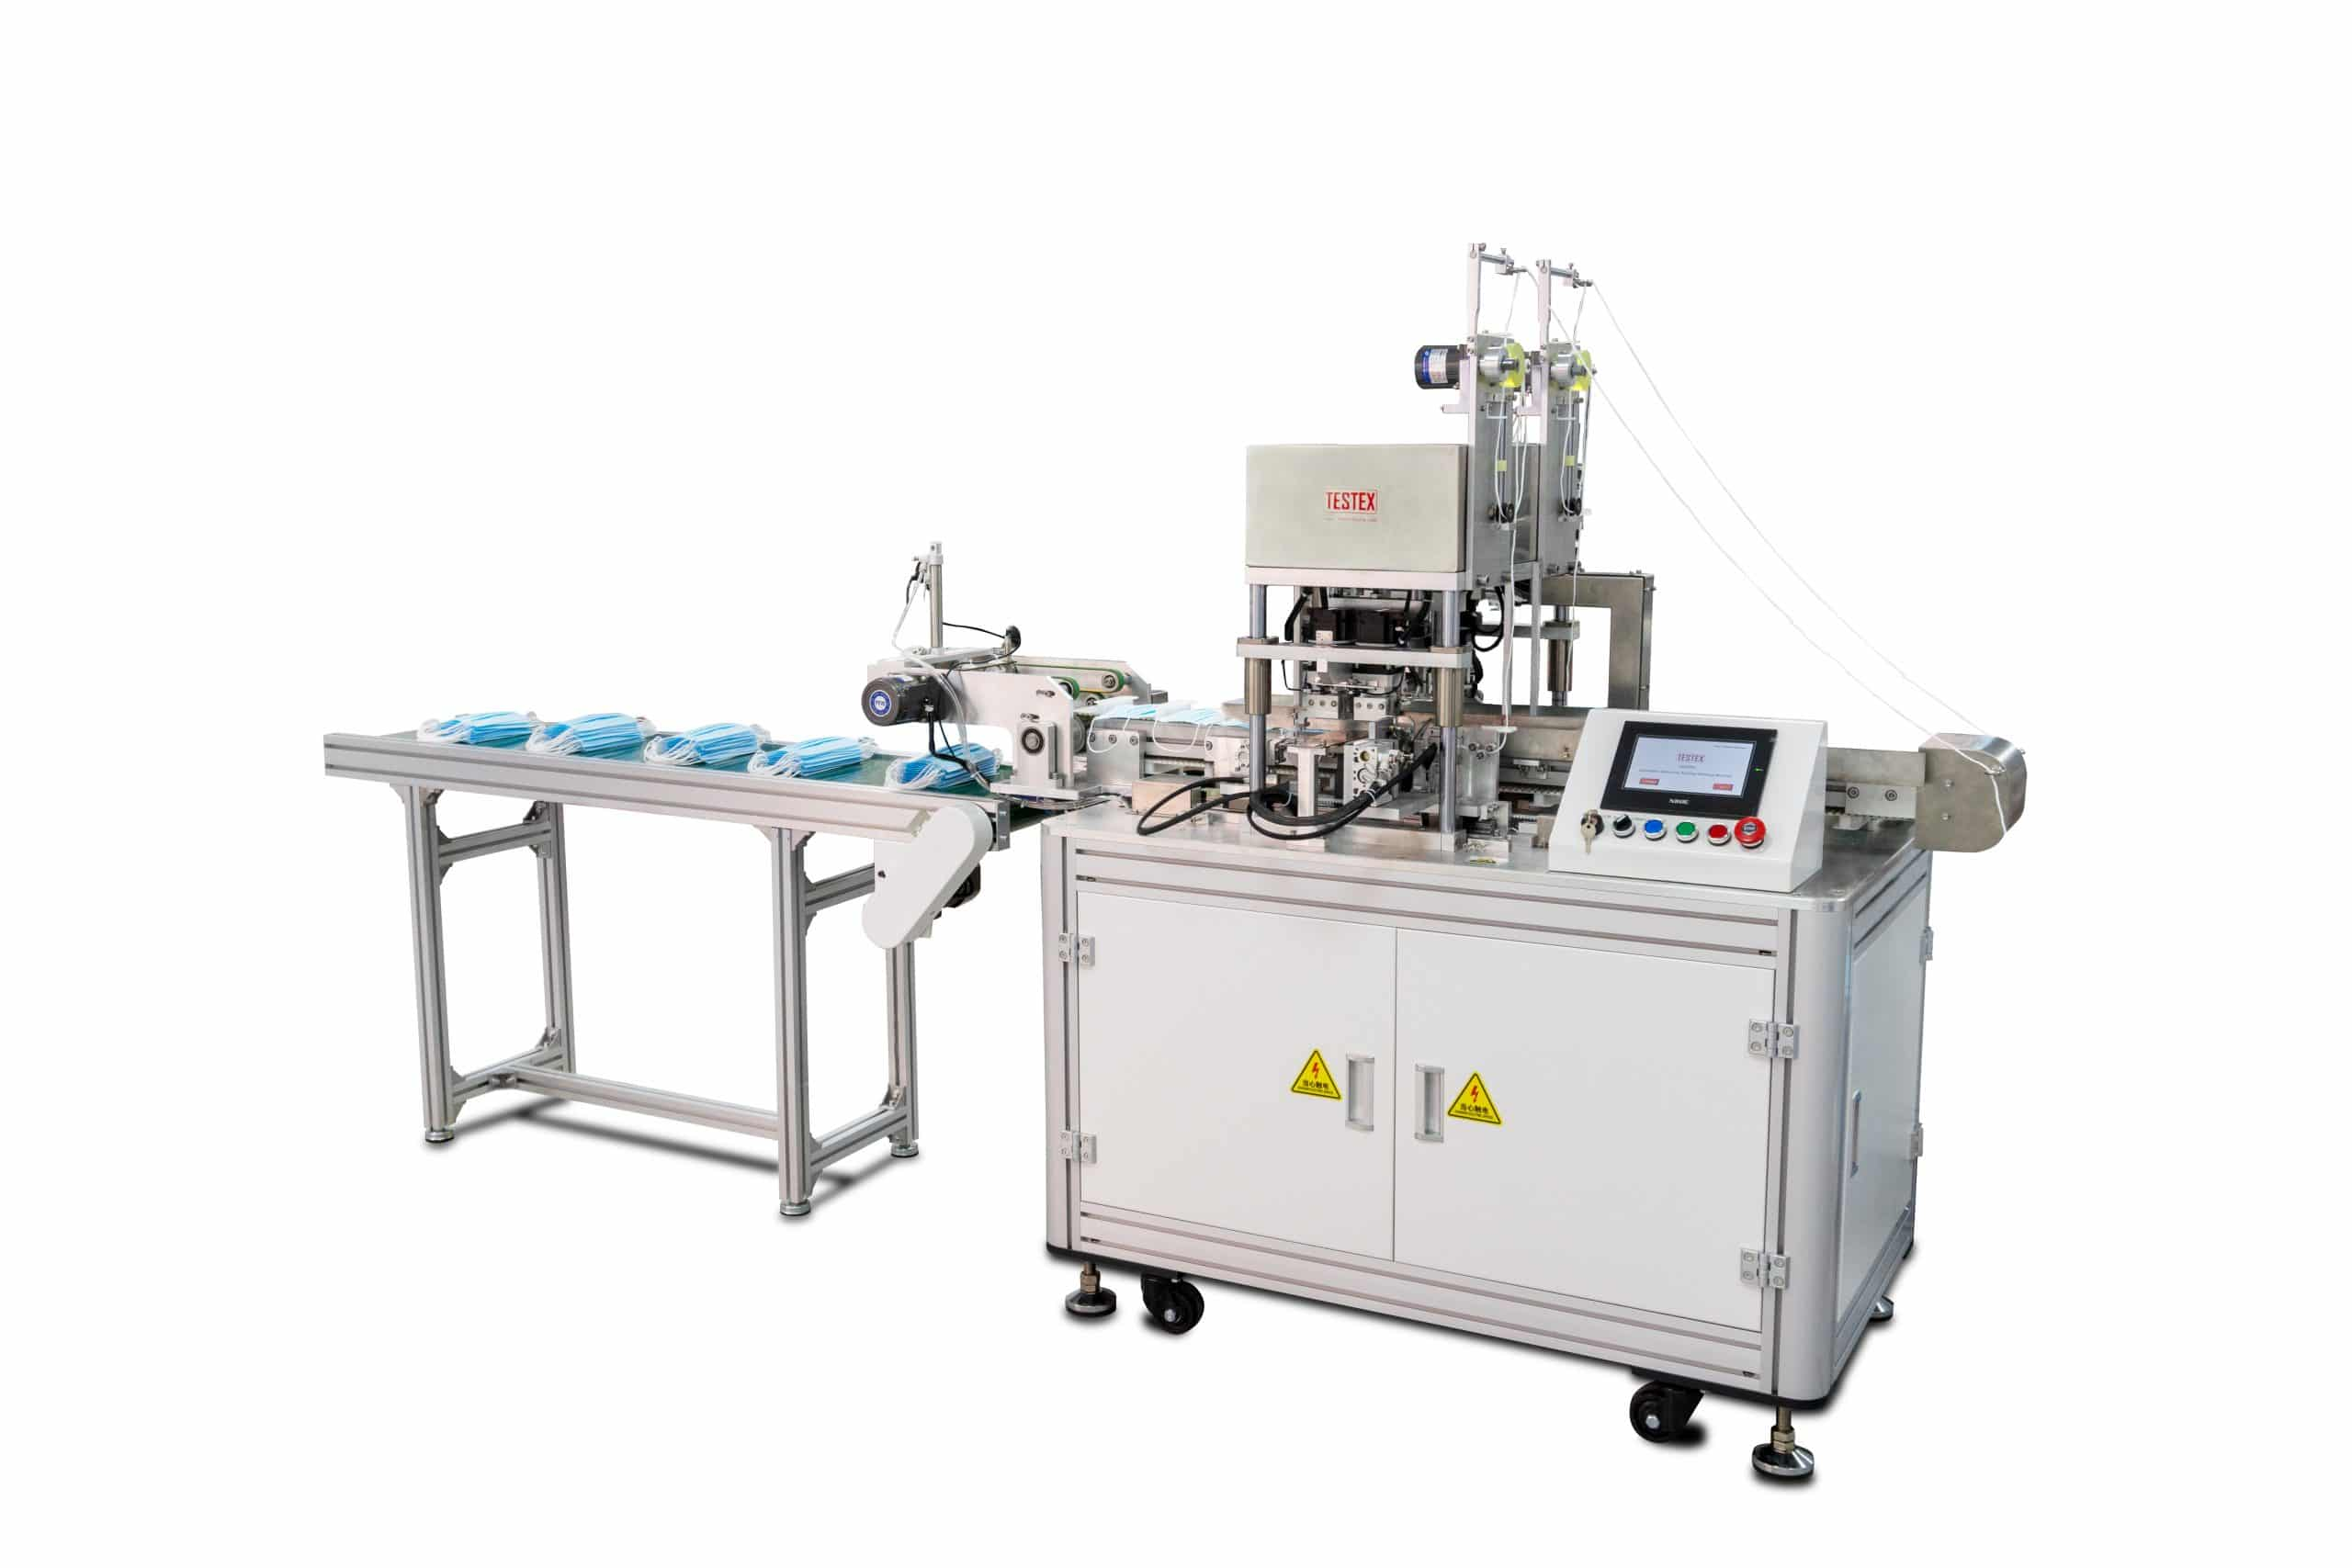 AUW80 Automatic Earloop Welding Machine